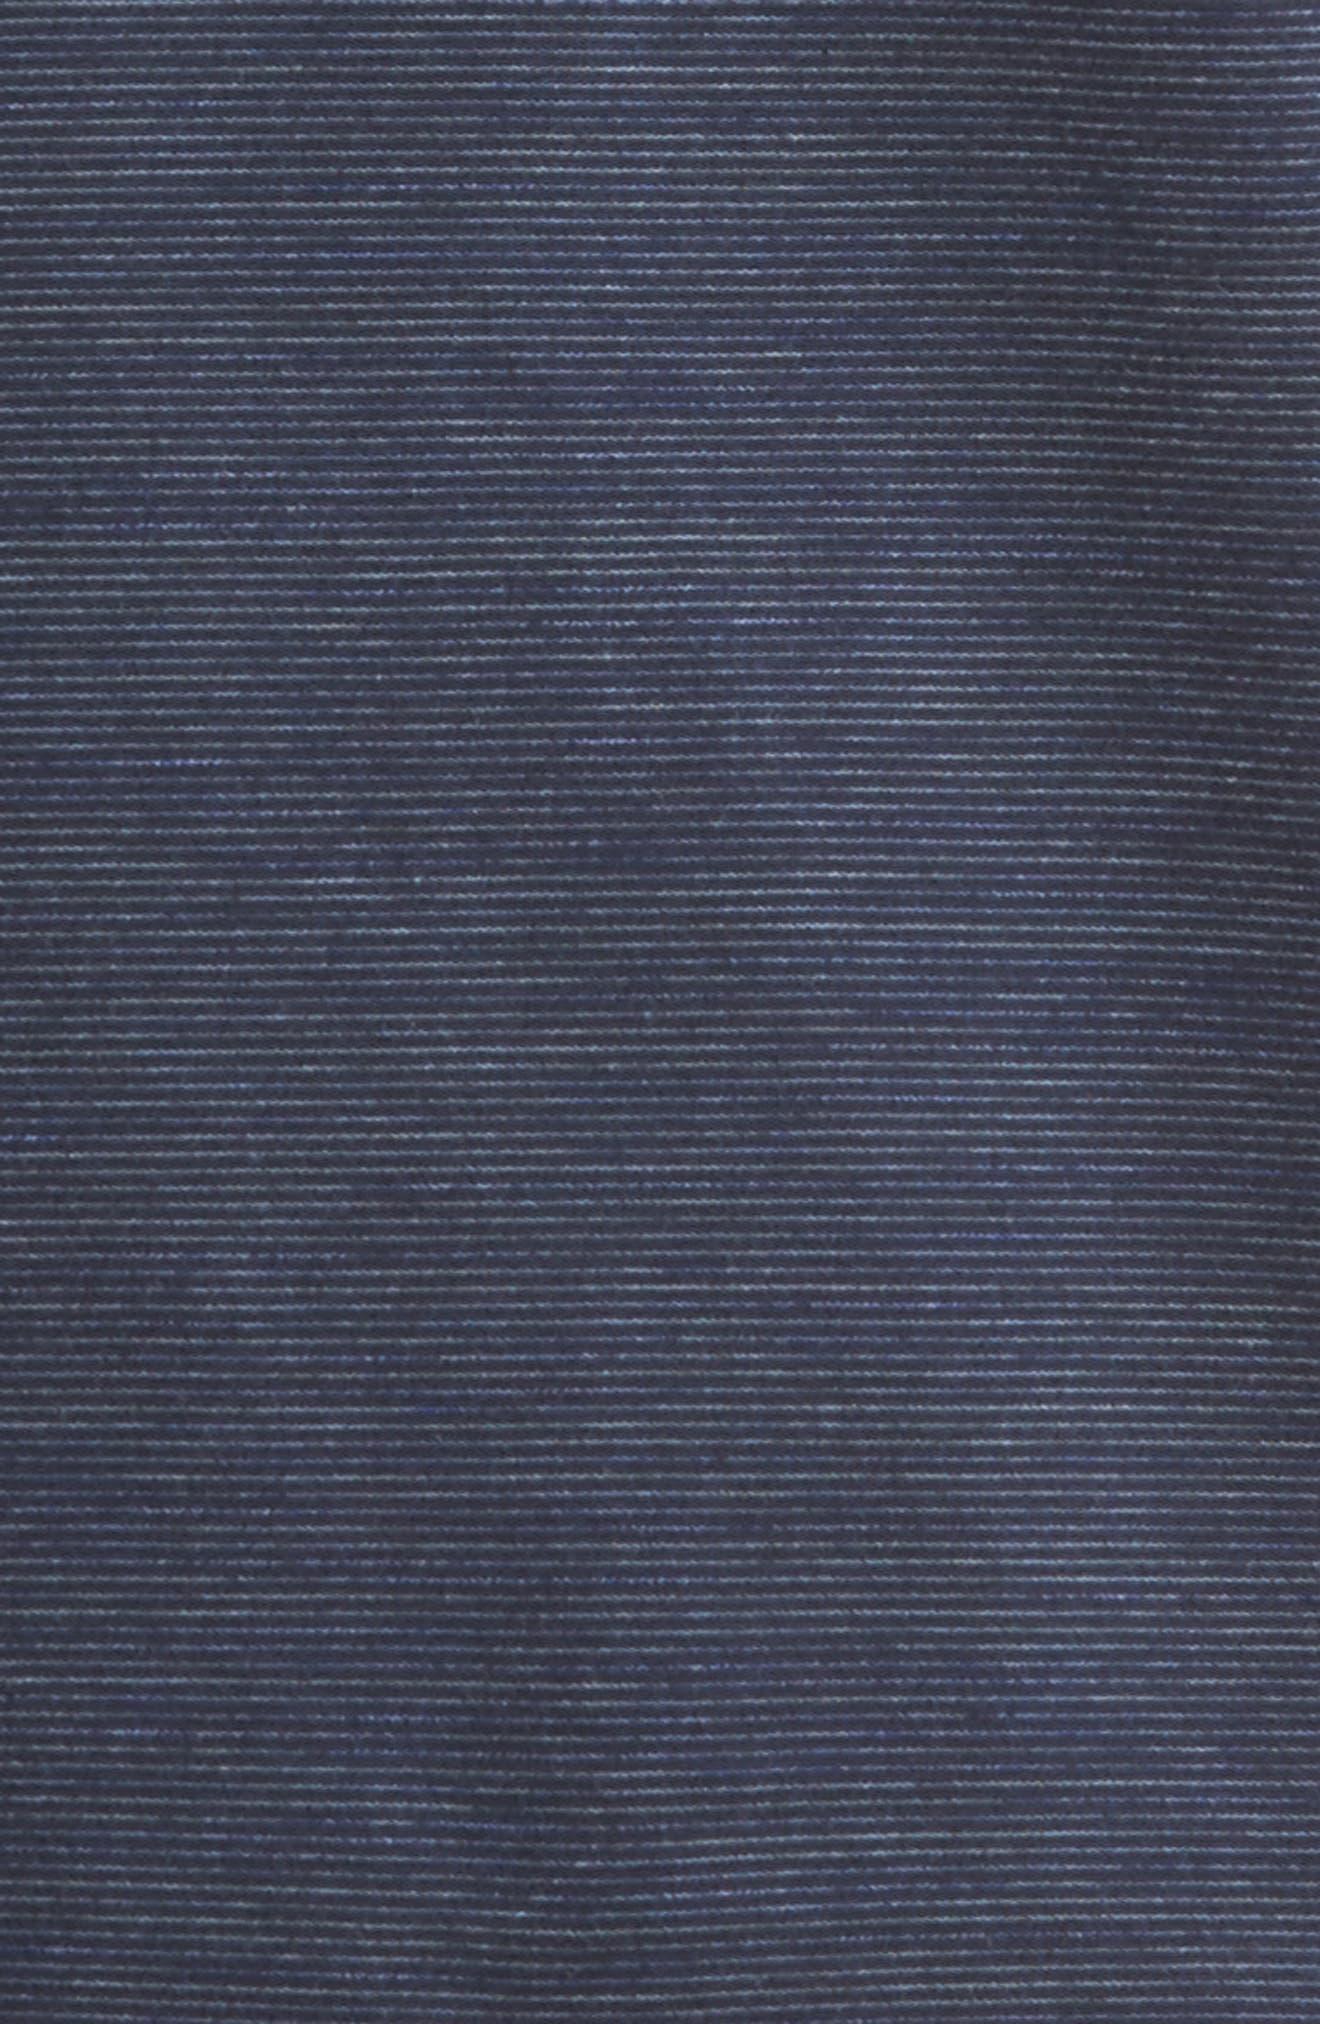 Space Dye Stripe Sweatshirt,                             Alternate thumbnail 5, color,                             Navy Night Spacedye